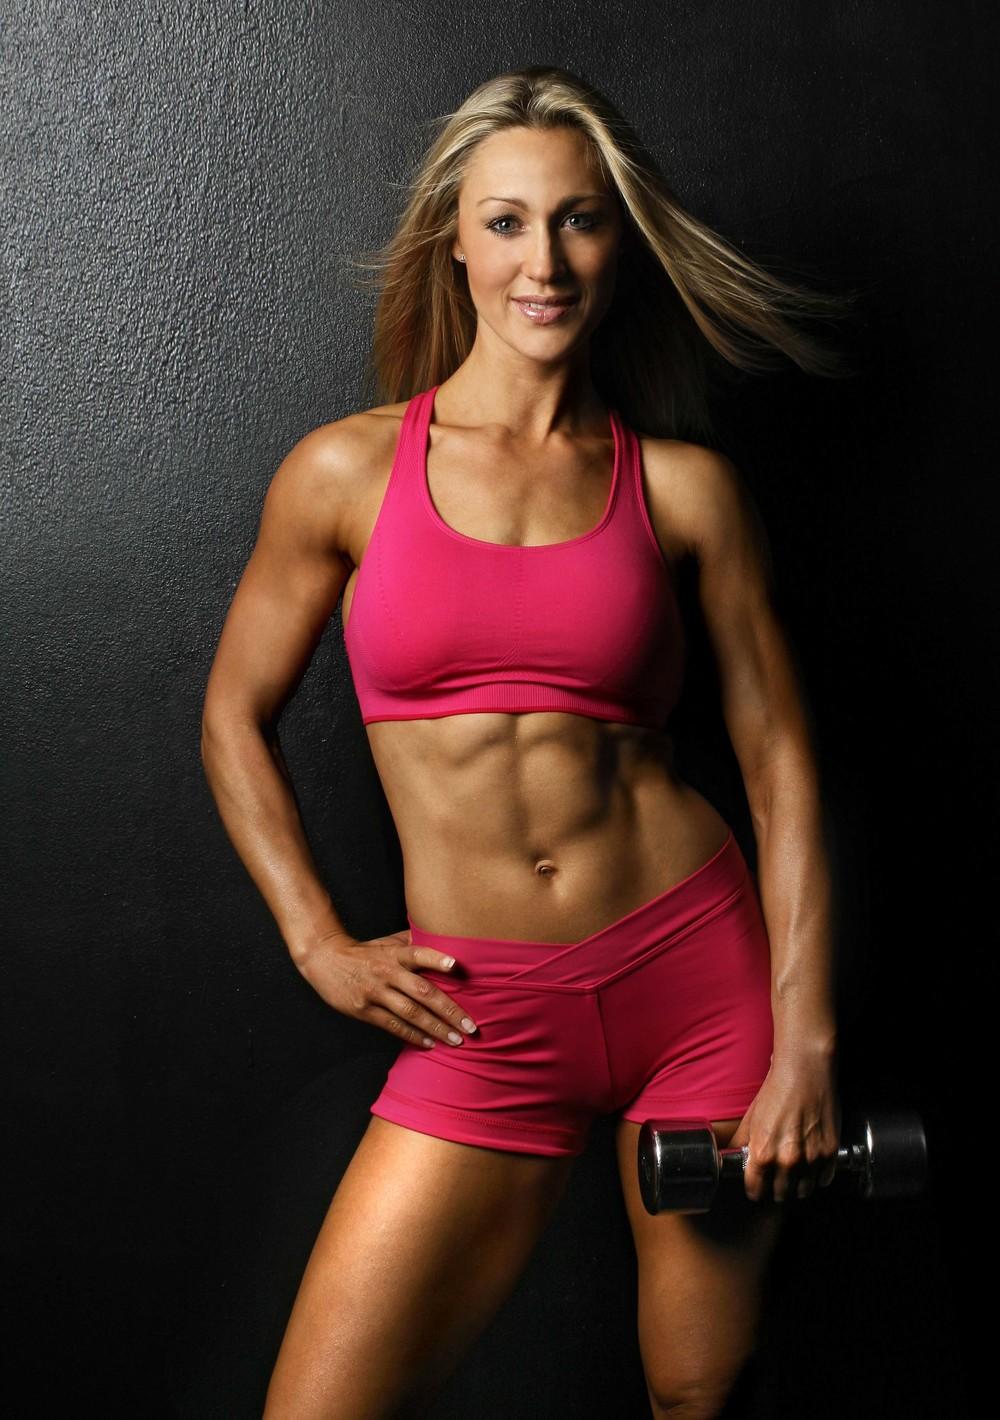 Caroline Pearce